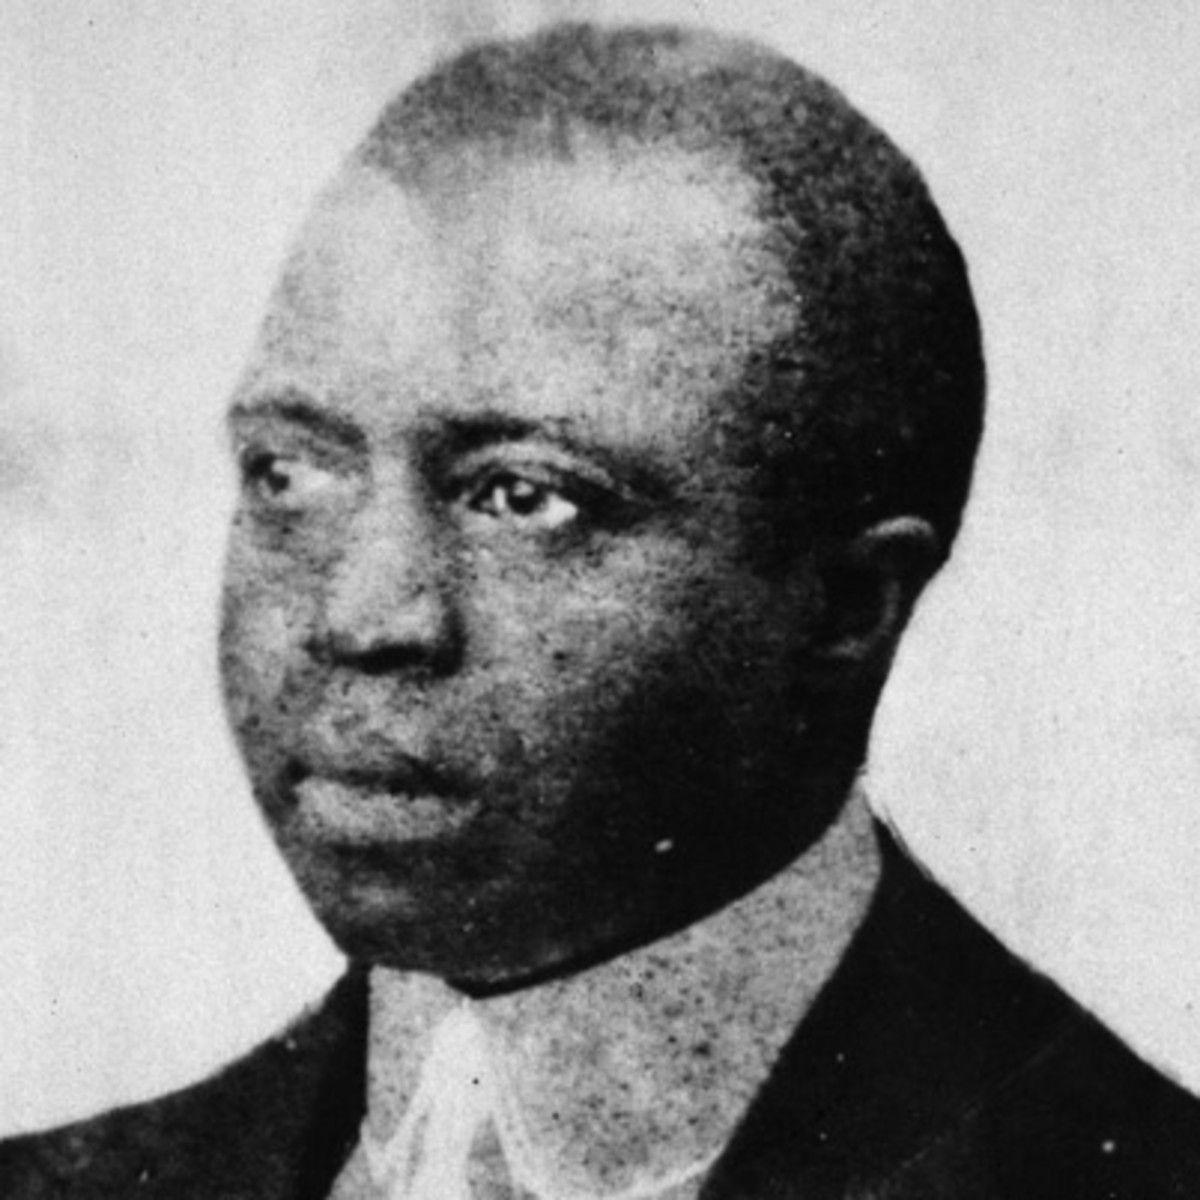 Scott Joplin 'o rei do ragtime' (1867-1917), post 1/2: Piano Rags com Jeremy Rifkin